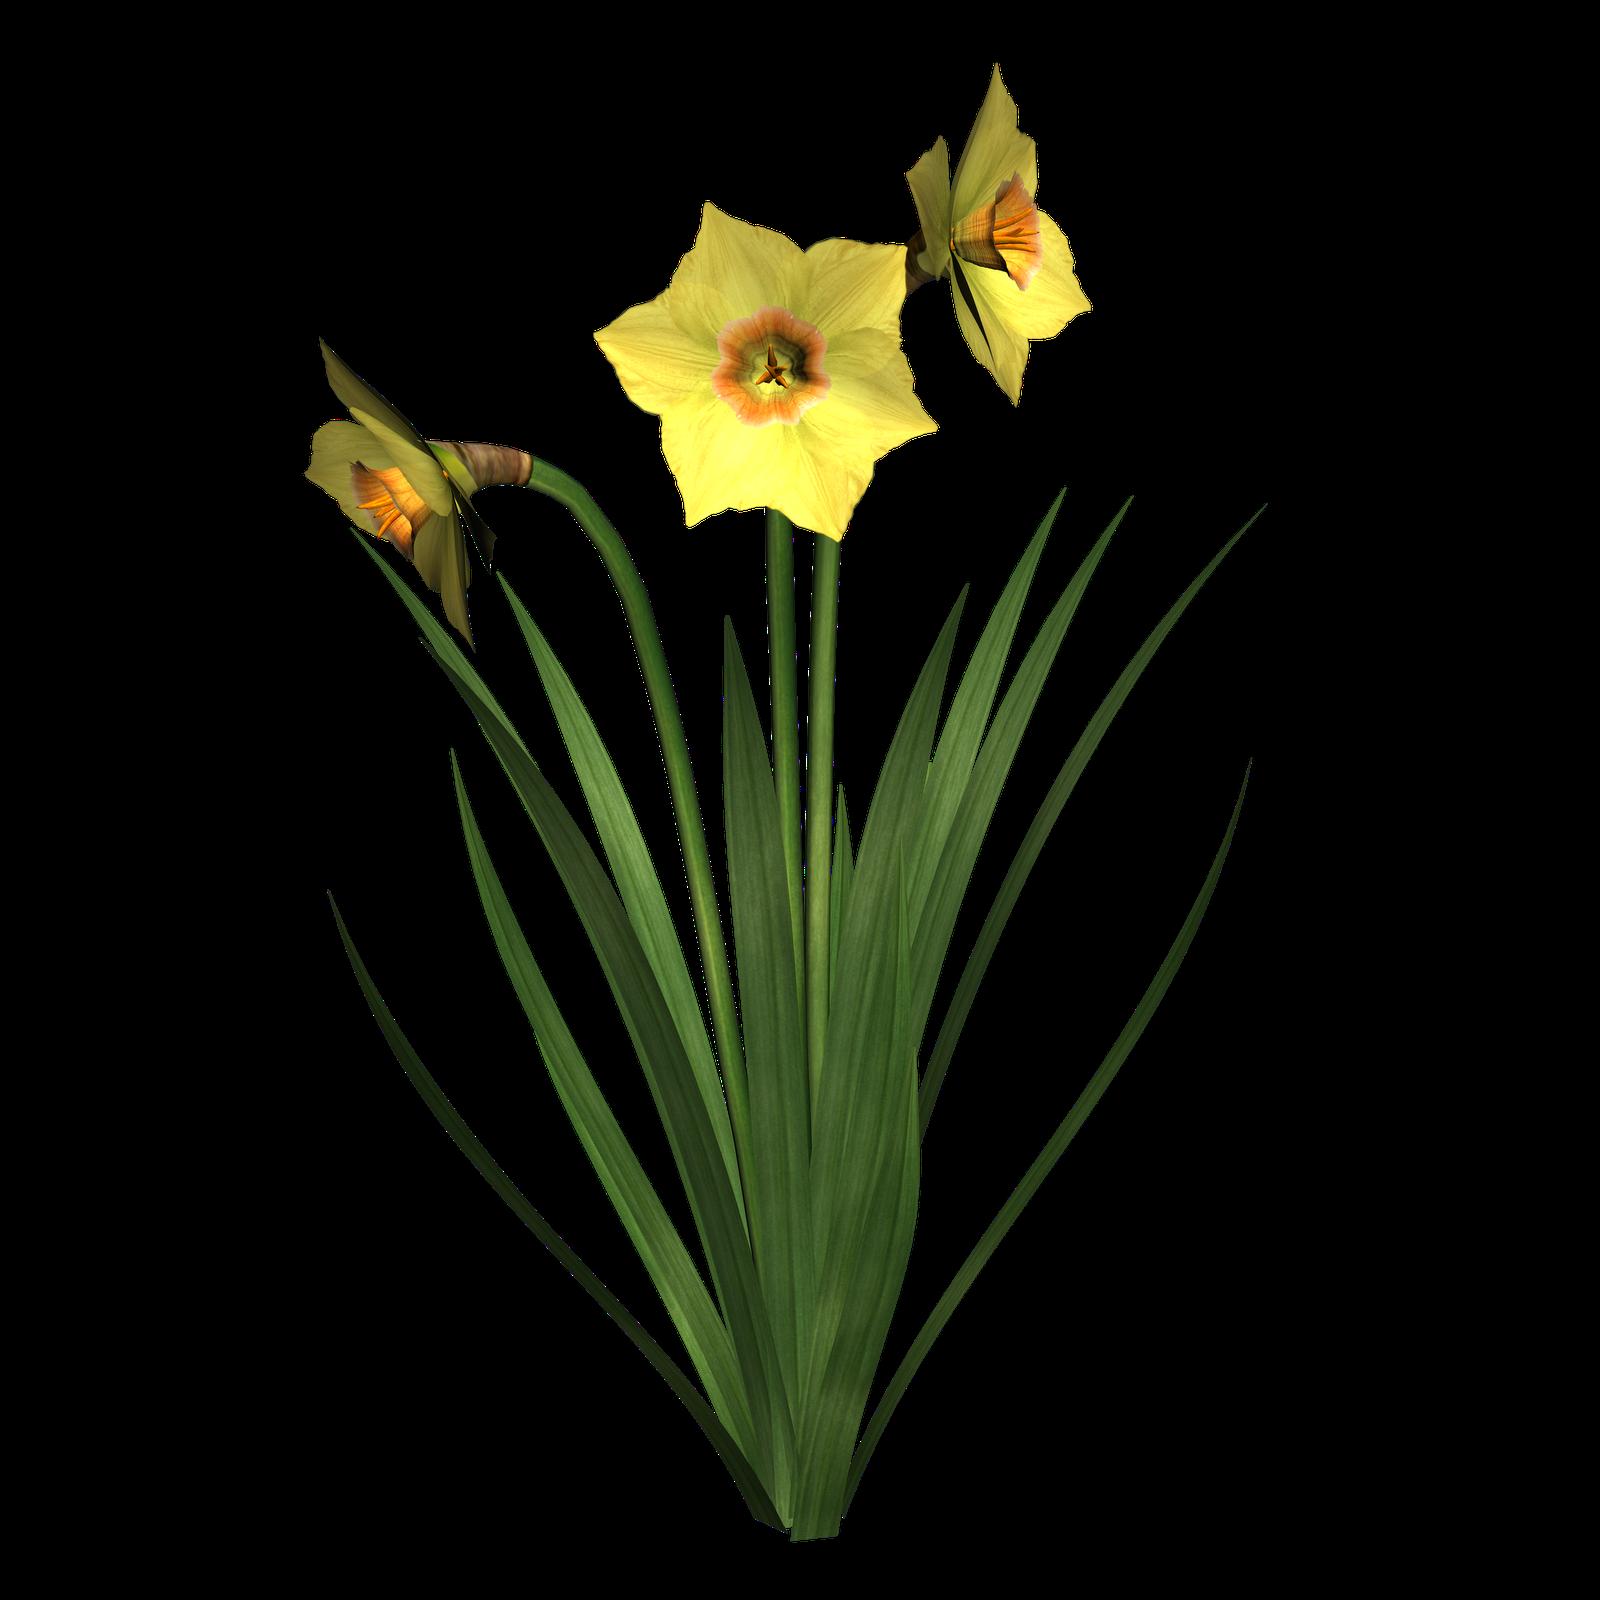 Daffodil Clip Art Free - ClipArt Best